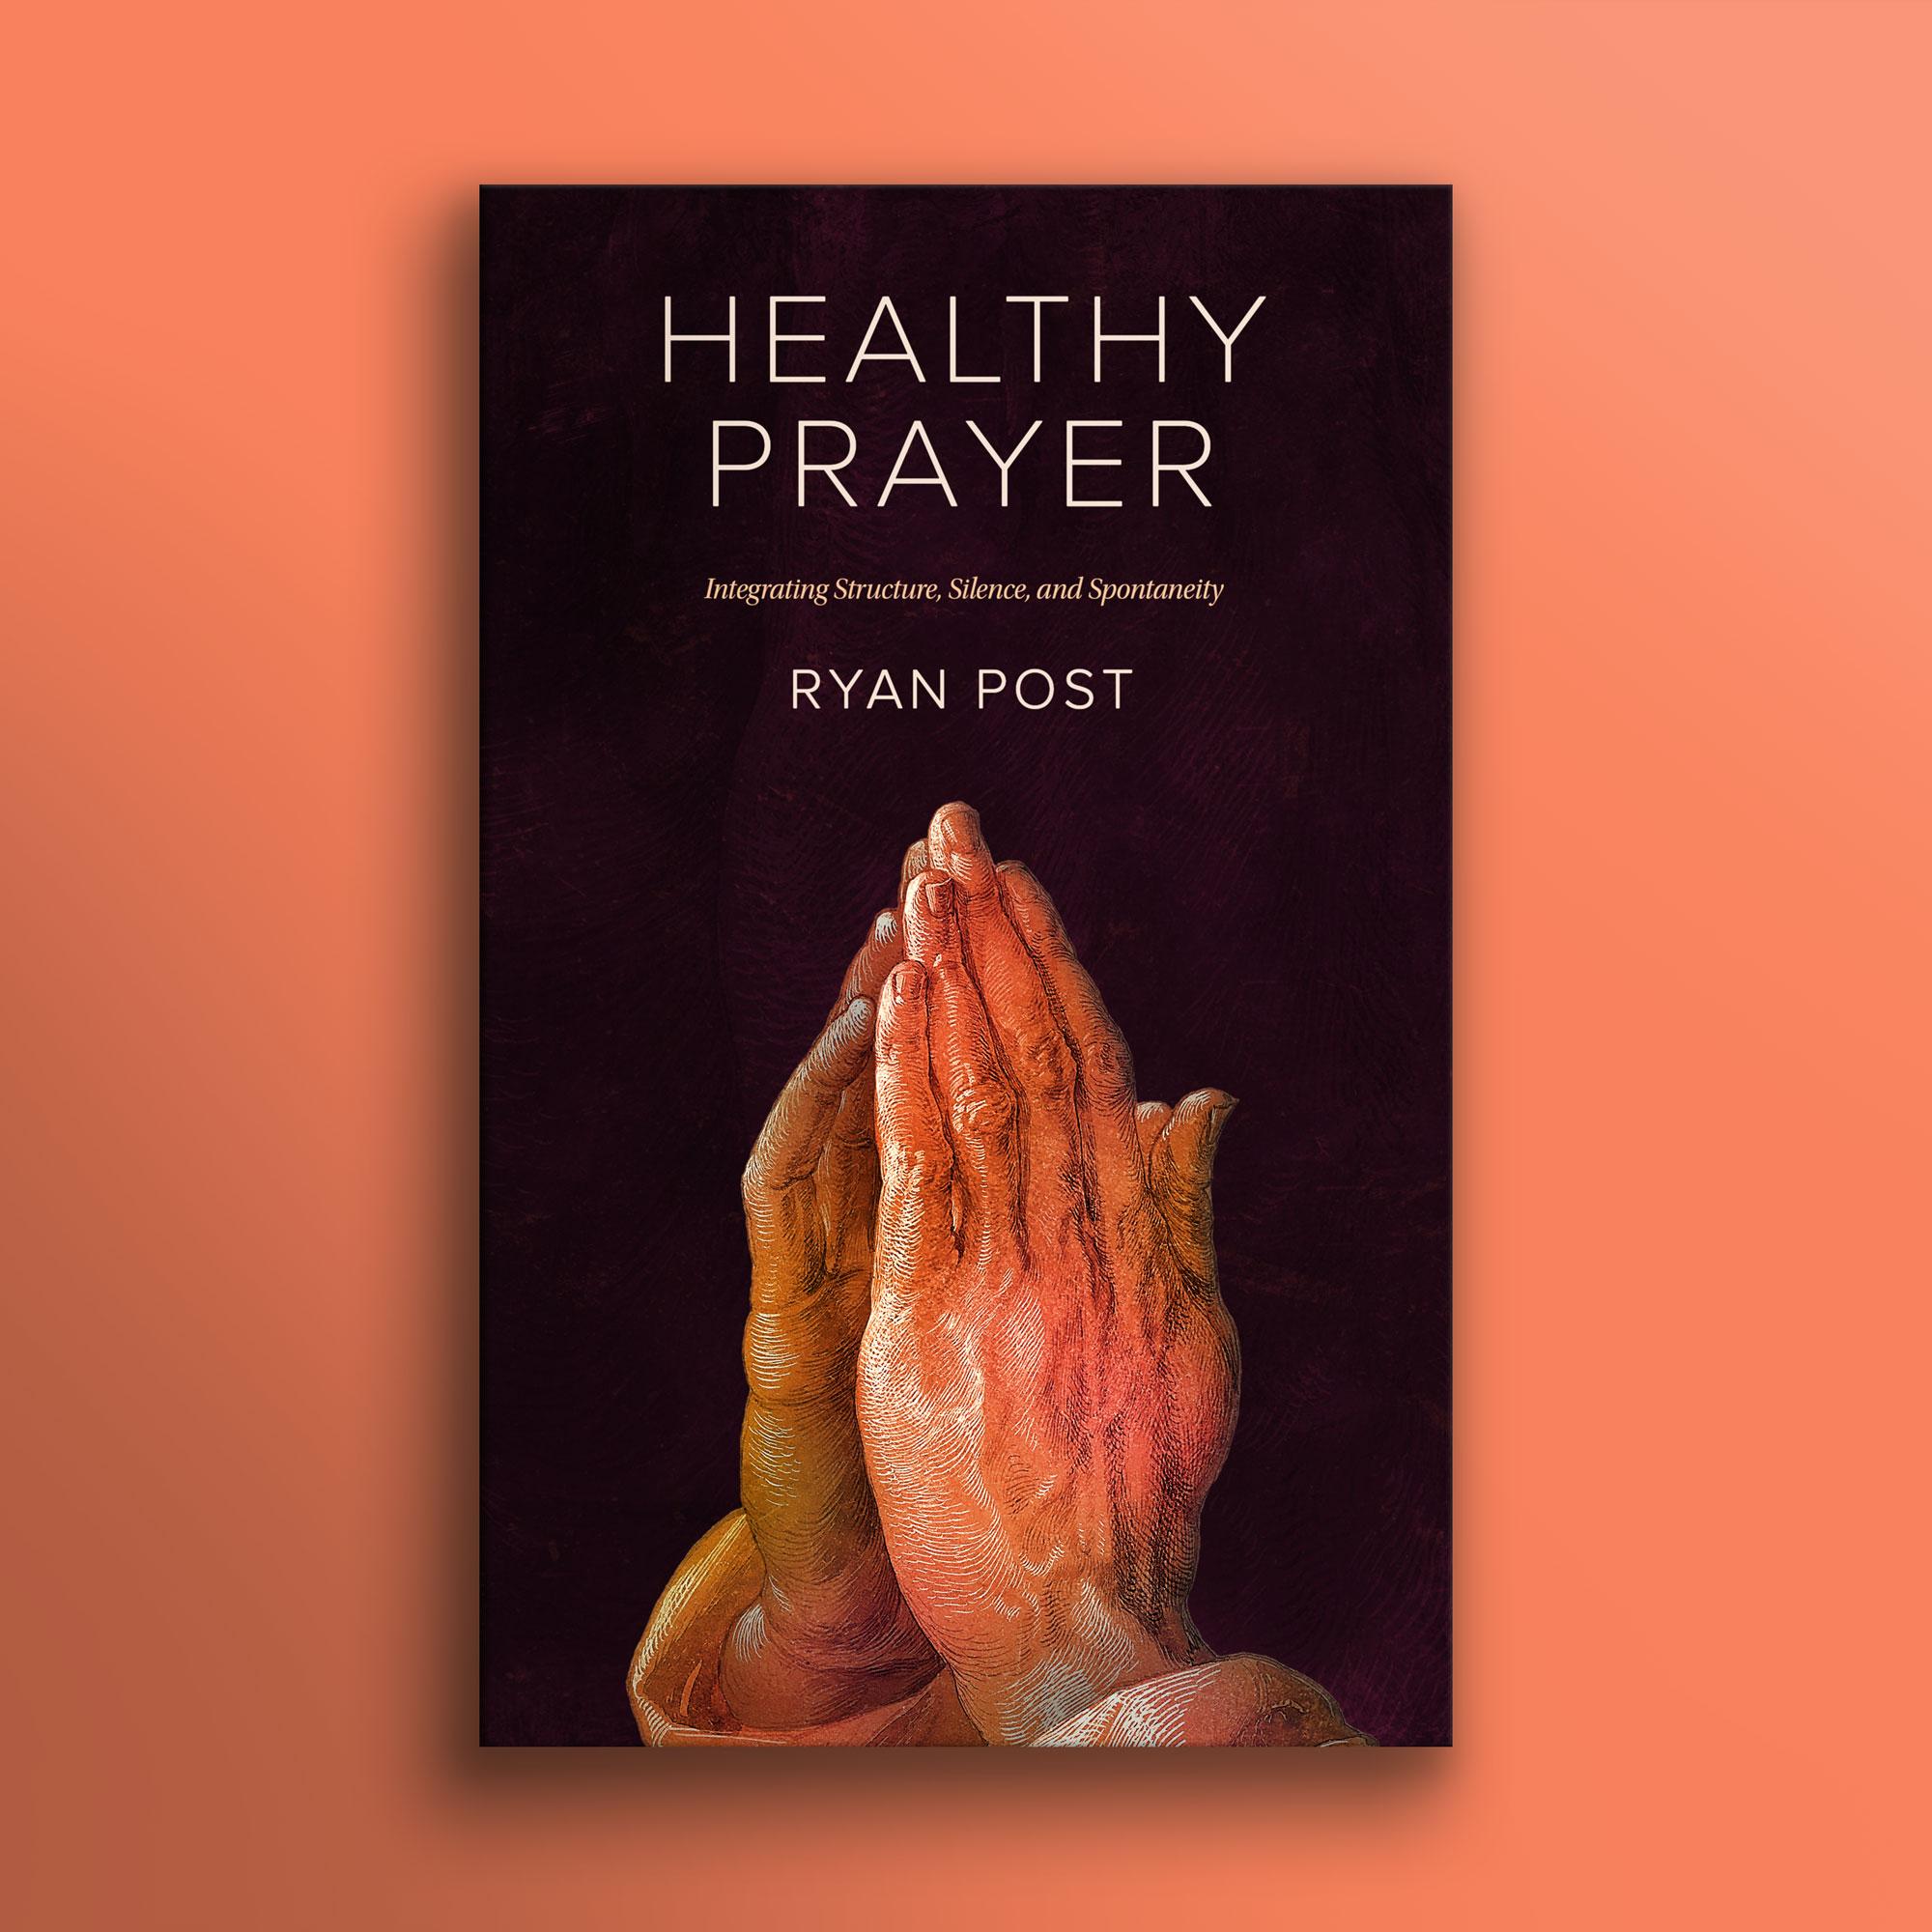 Healthy-Prayer_Cover-Art-Mockup.jpg